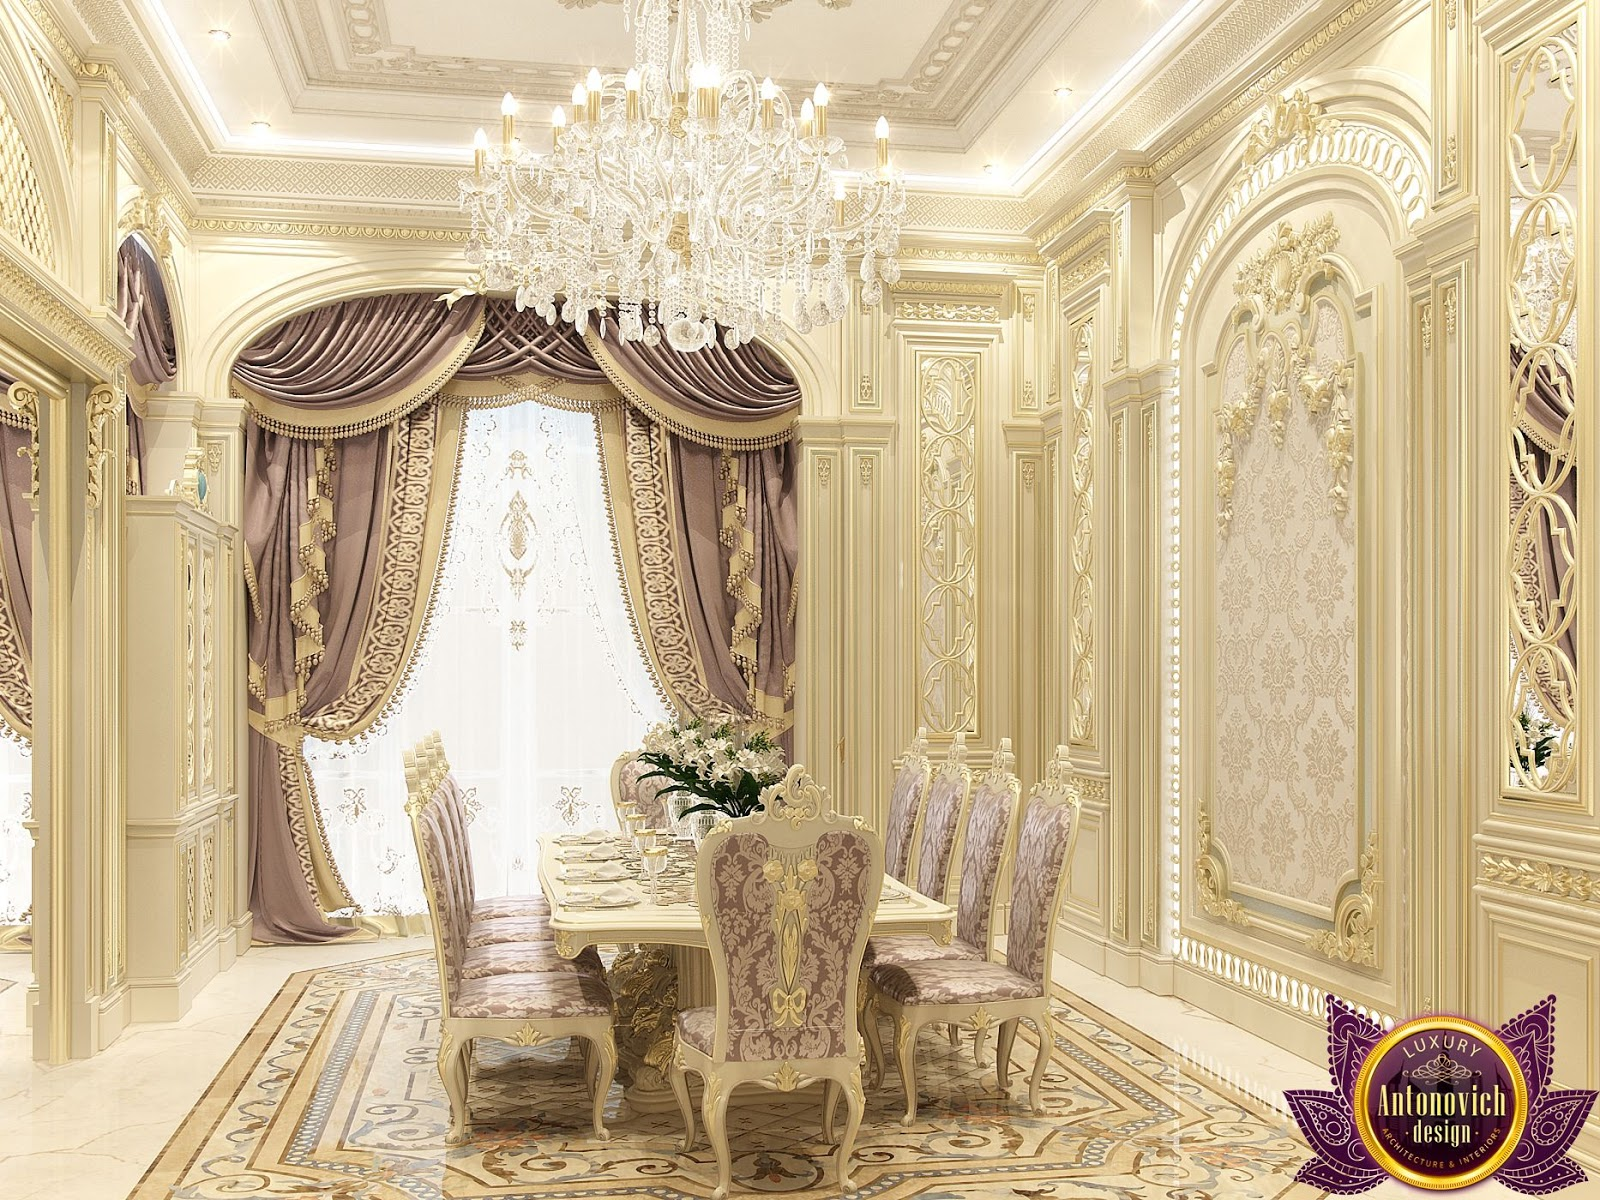 Kitchen Design Usa By Katrina Antonovich: Kenyadesign: Dining Room Interior Design Of Katrina Antonovich